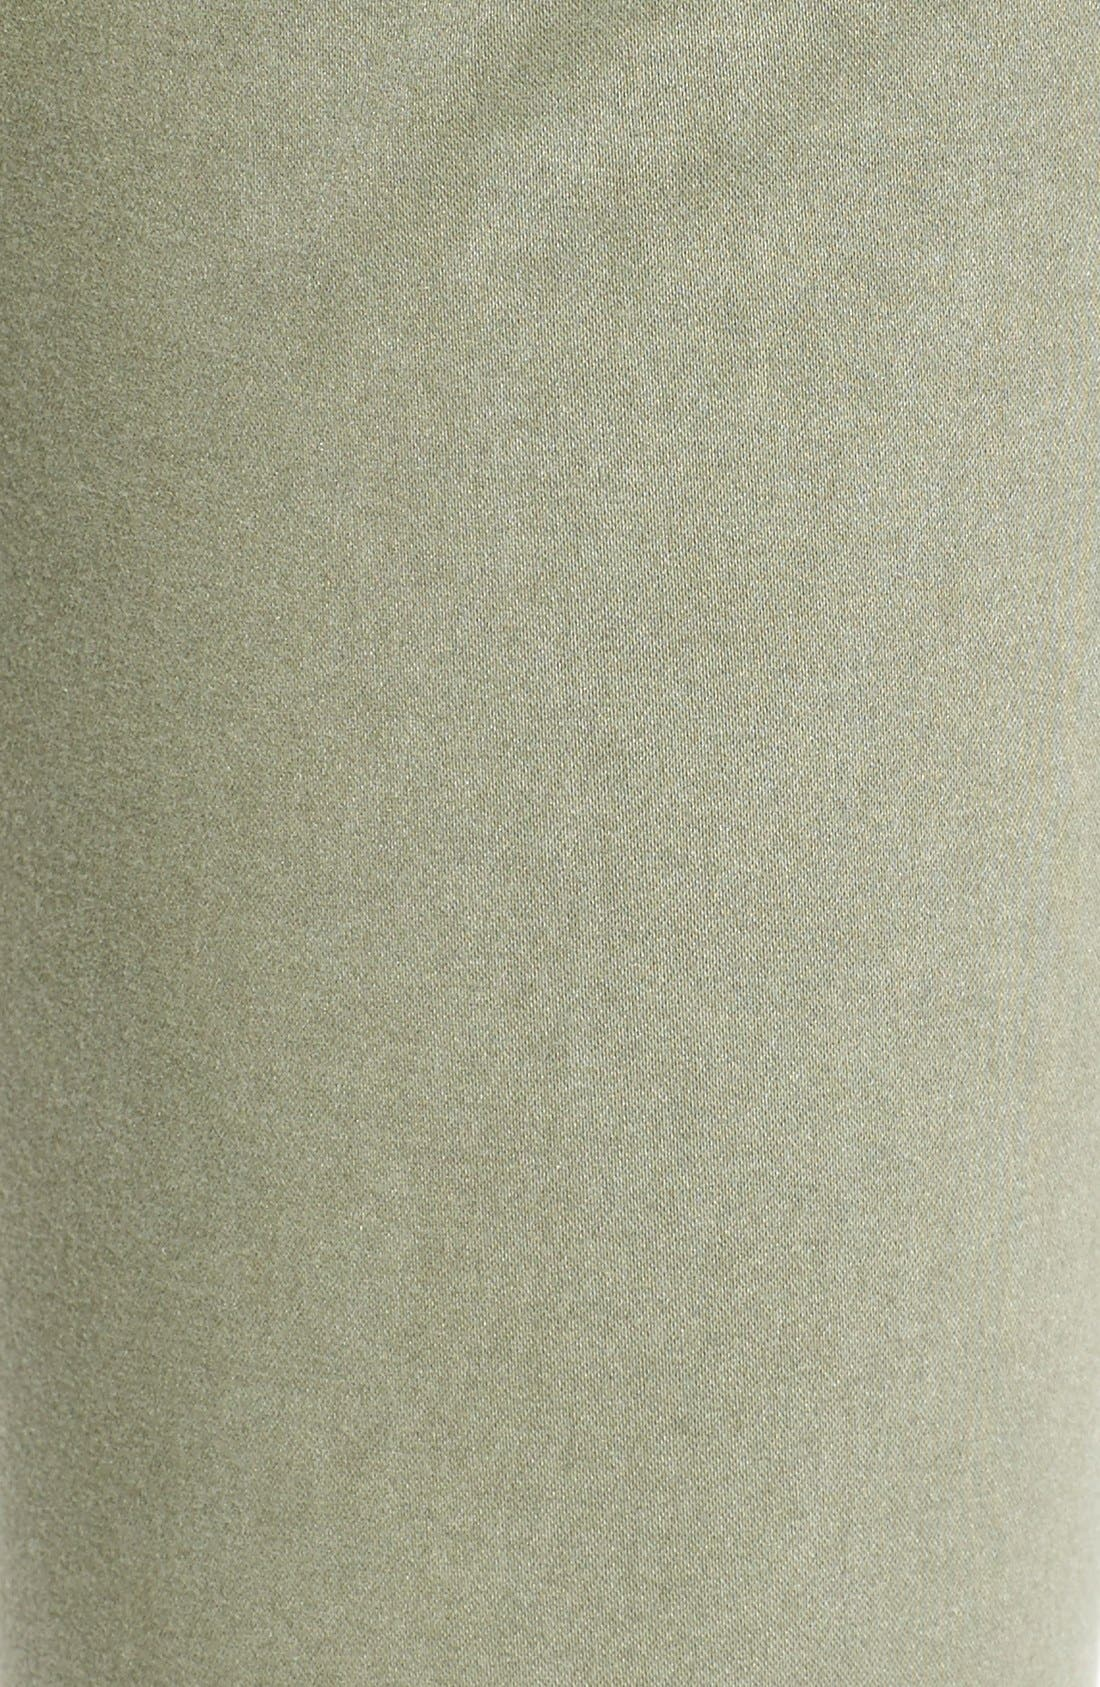 Alternate Image 5  - Hudson Jeans 'Nico' Ankle Super Skinny Jeans (Earth Works)